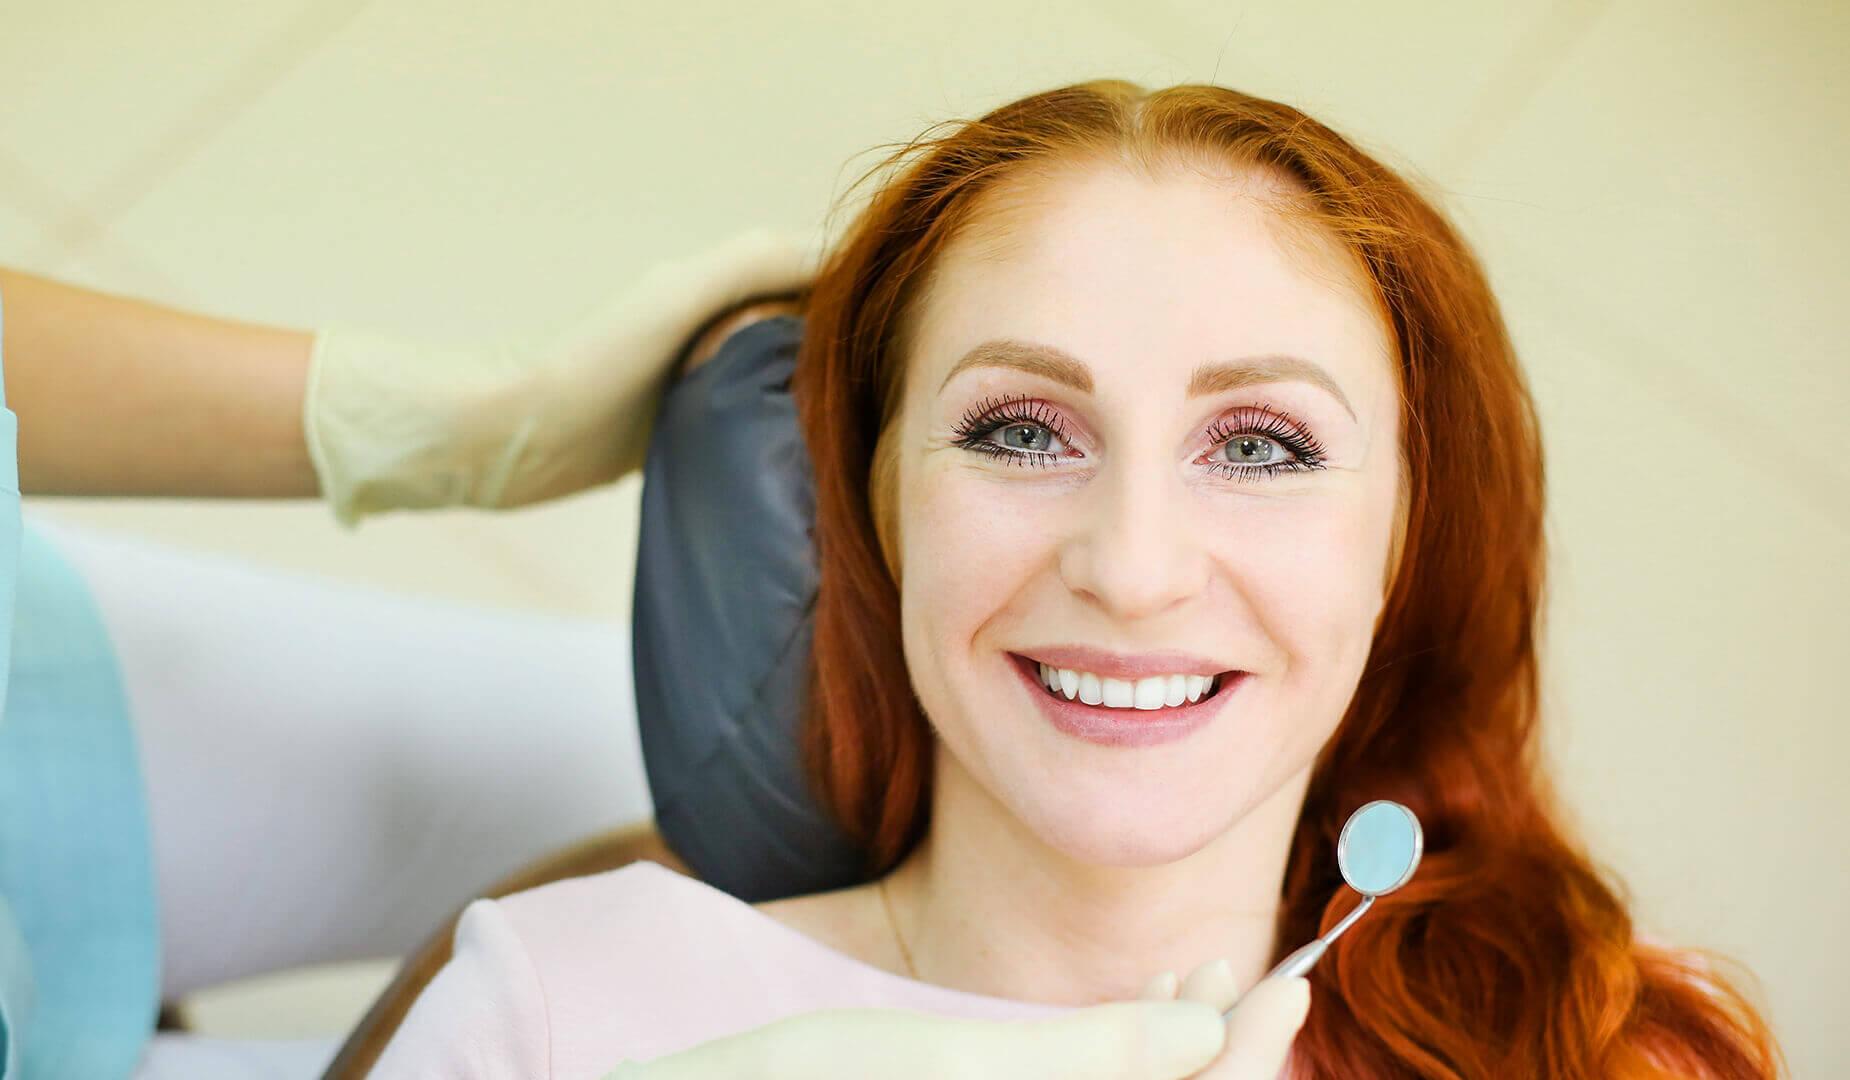 Улыбка пациентки после лечения